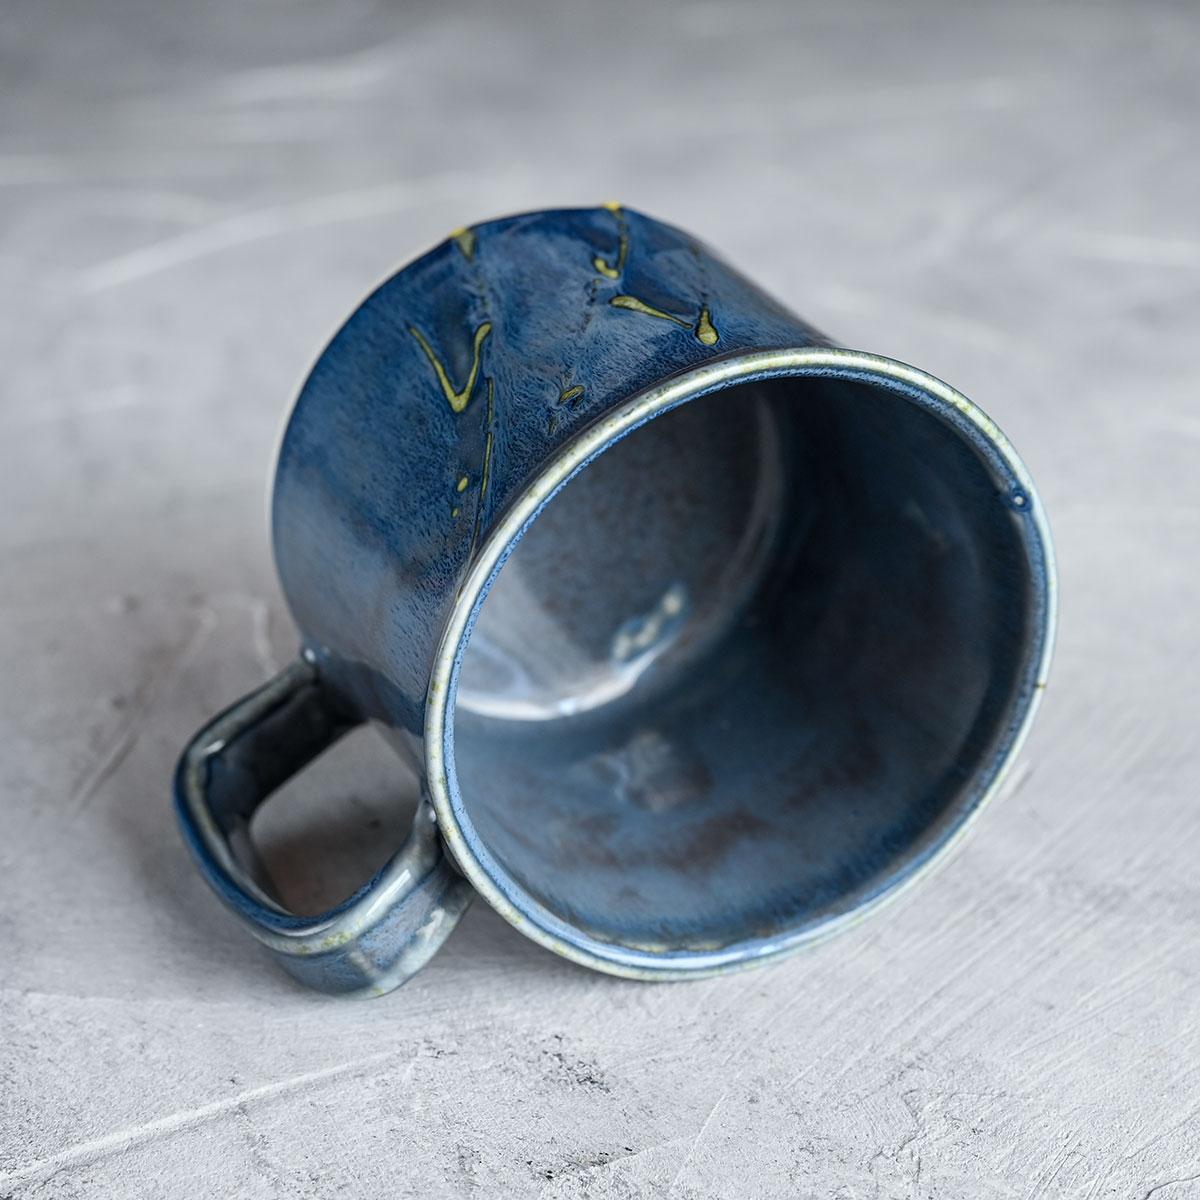 картинка Фарфоровая кружка Александра Заболотникова 5 - DishWishes.Ru